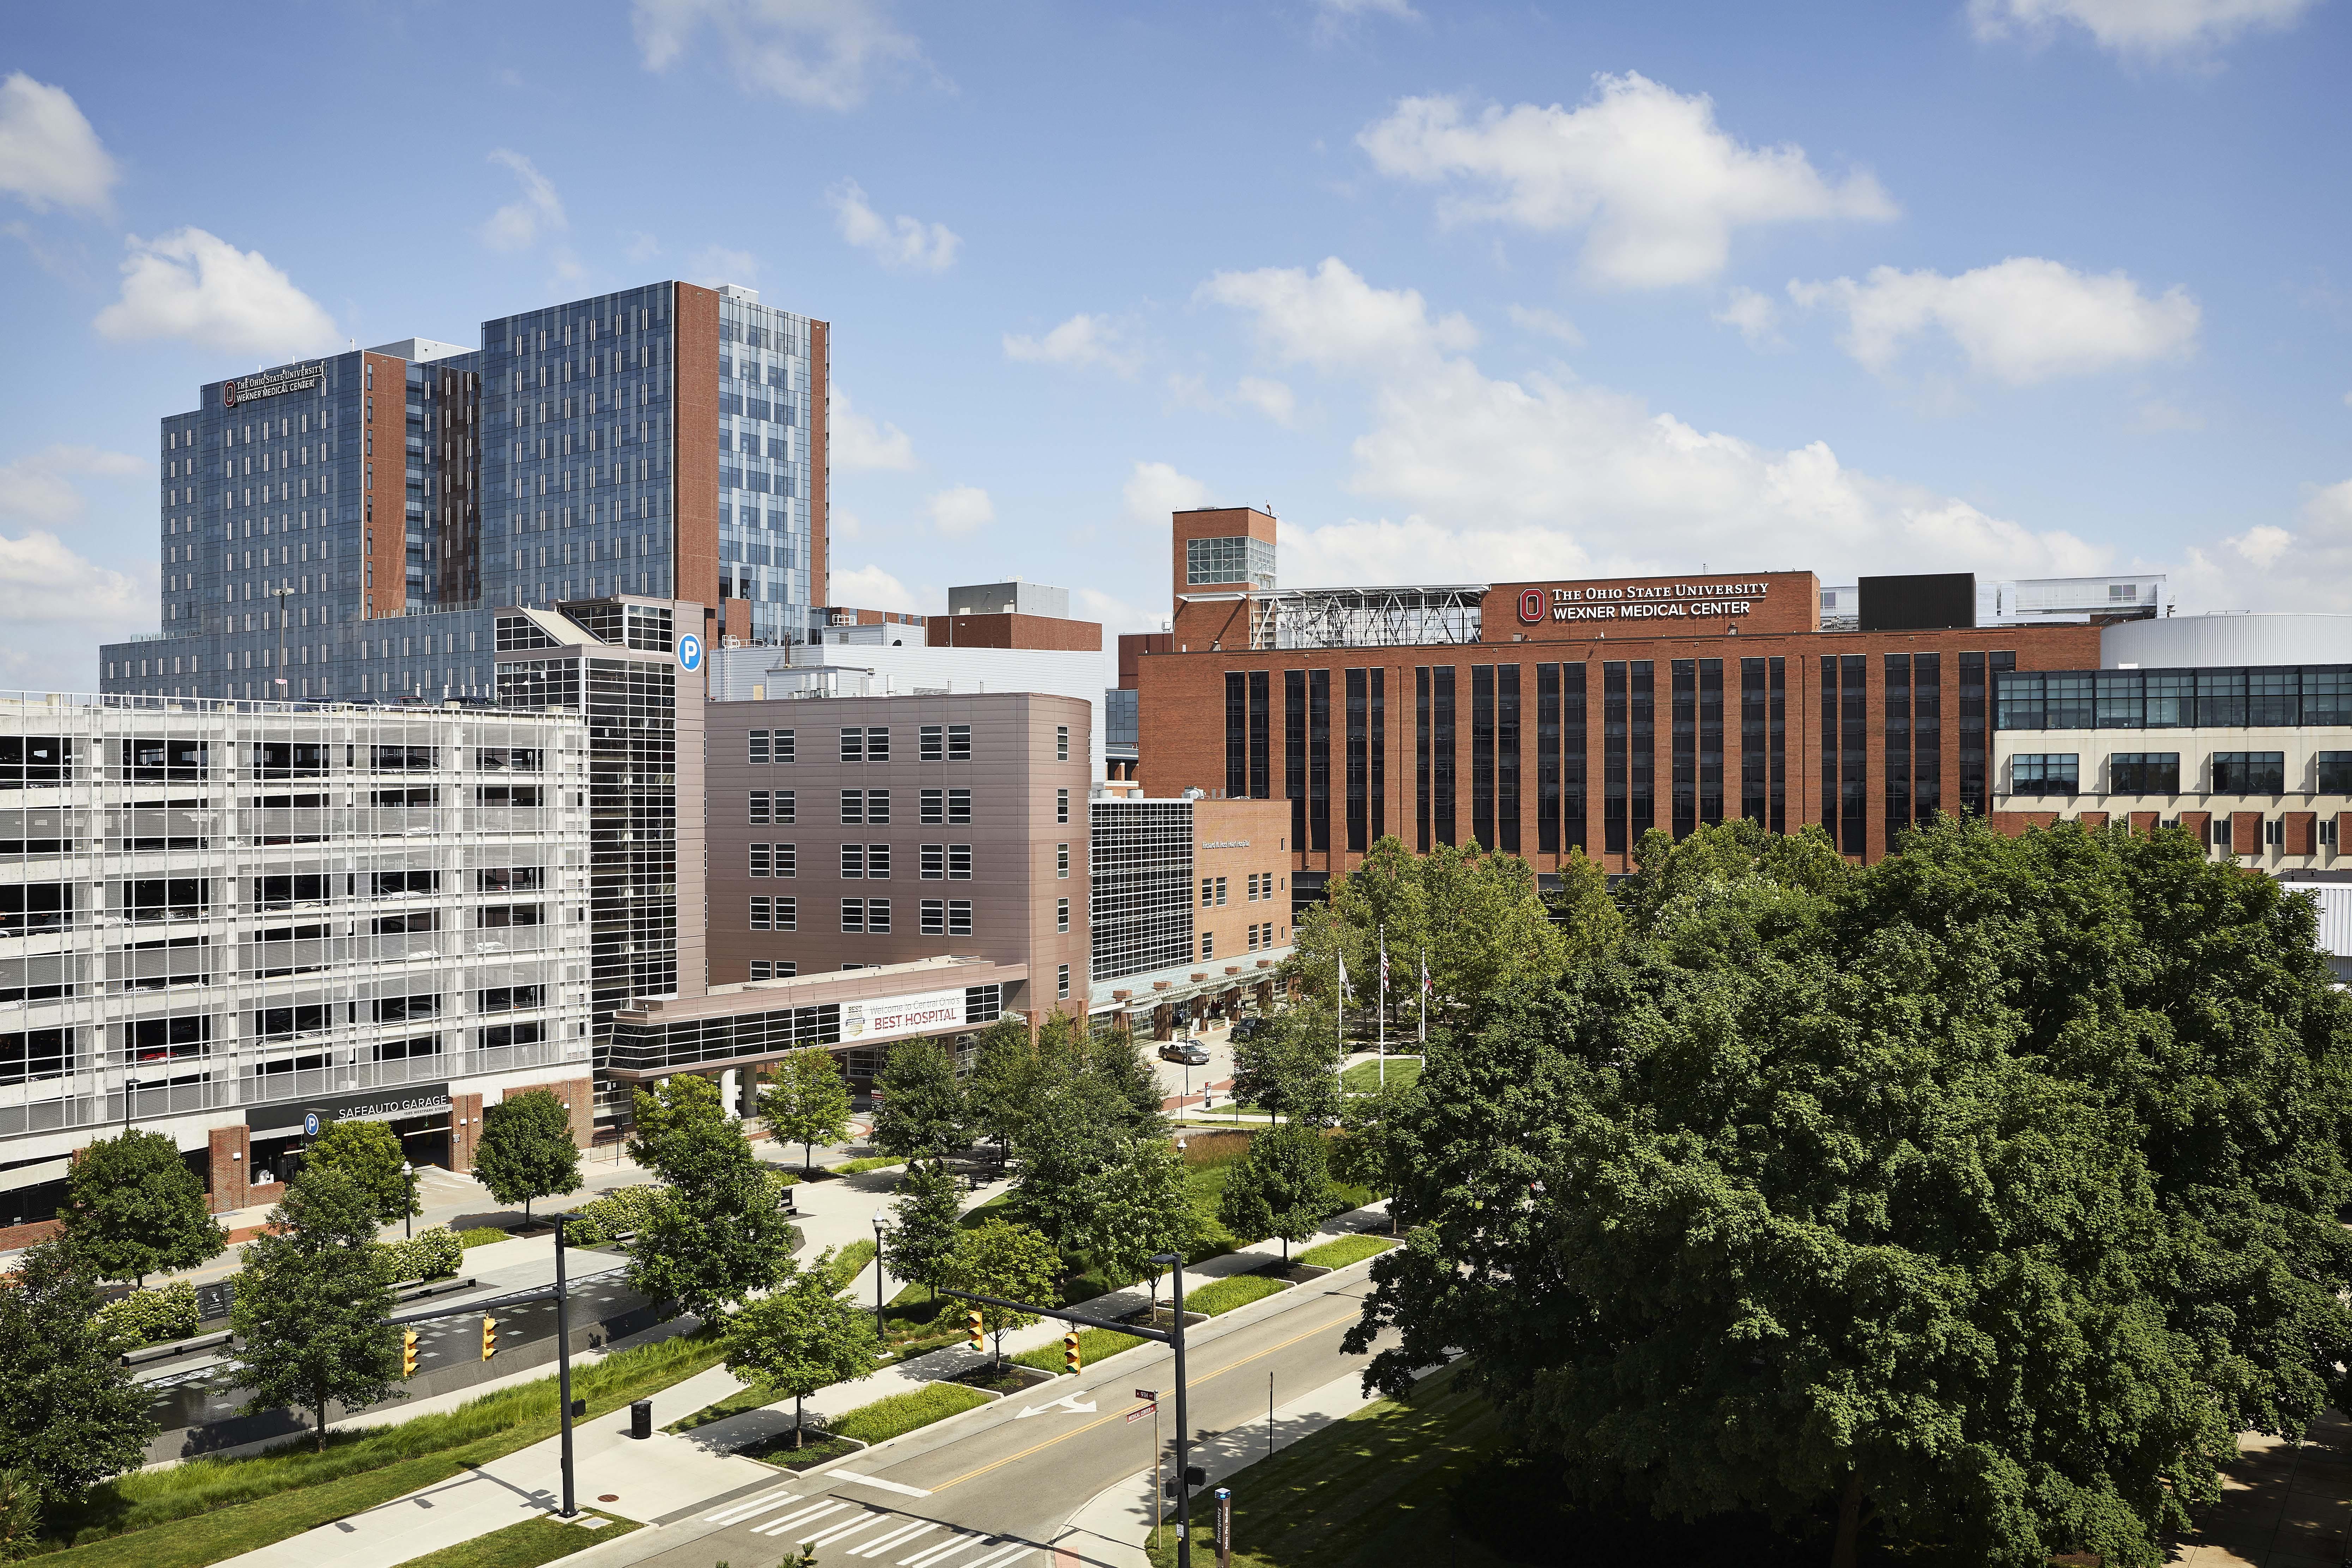 University Hospital buildings